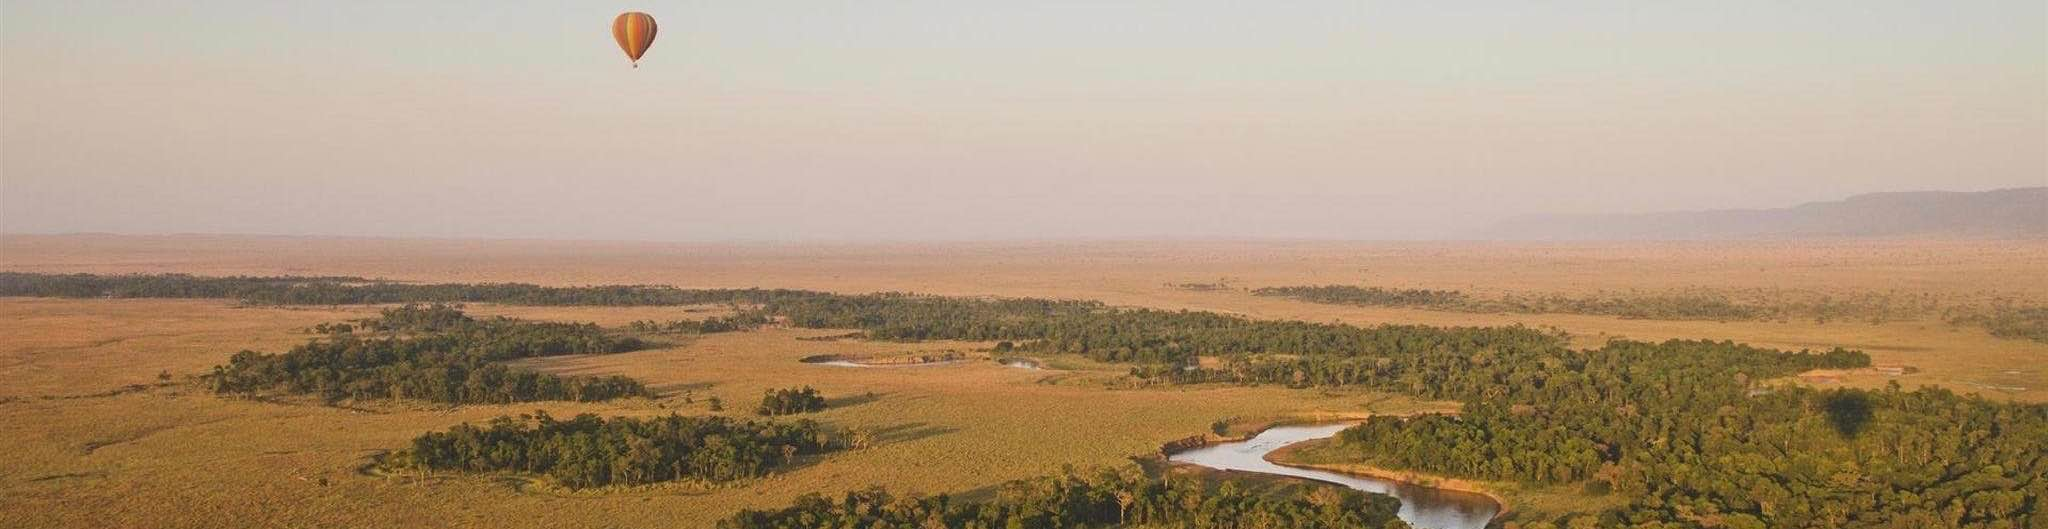 Kenya-Photographic-Safaris-Hot-Air-Ballo